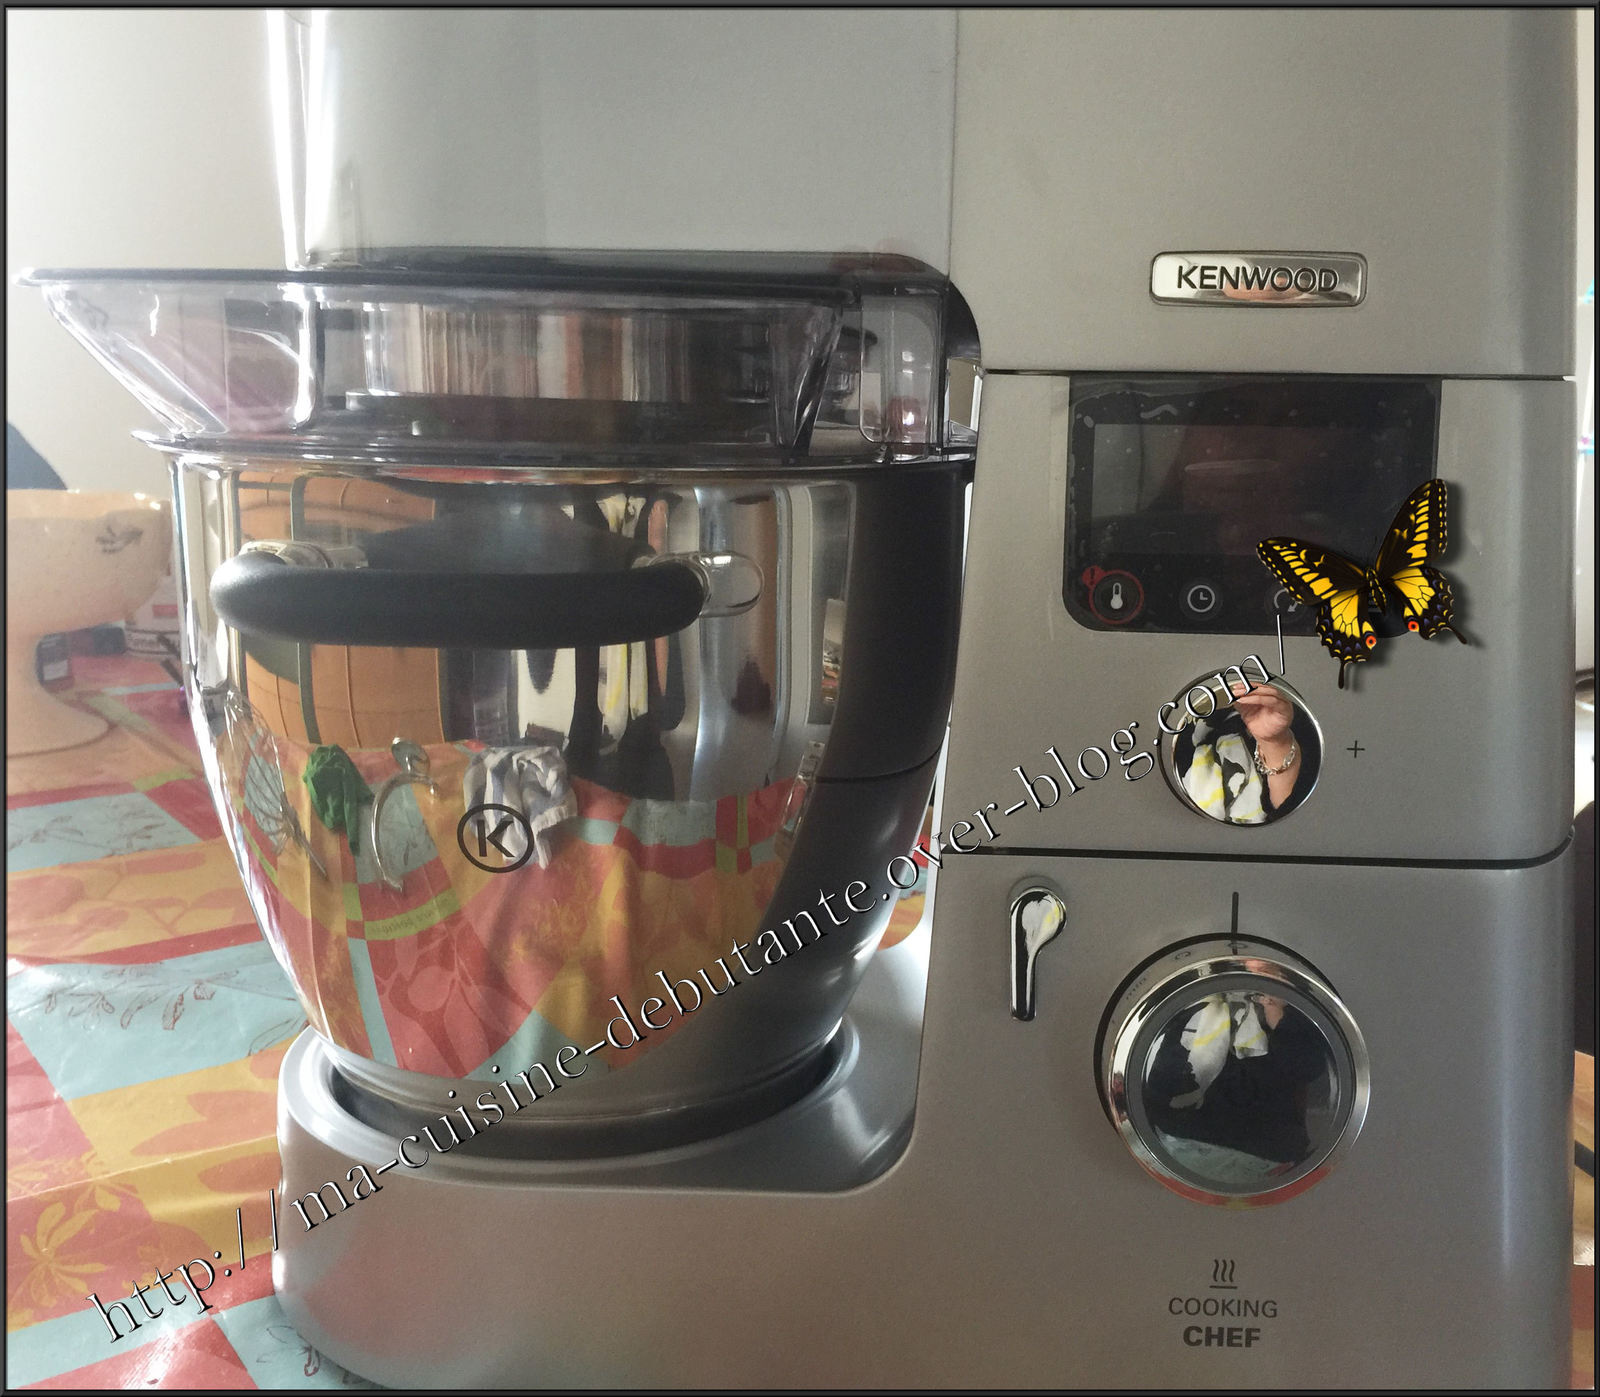 recette kenwood cooking chef gourmet